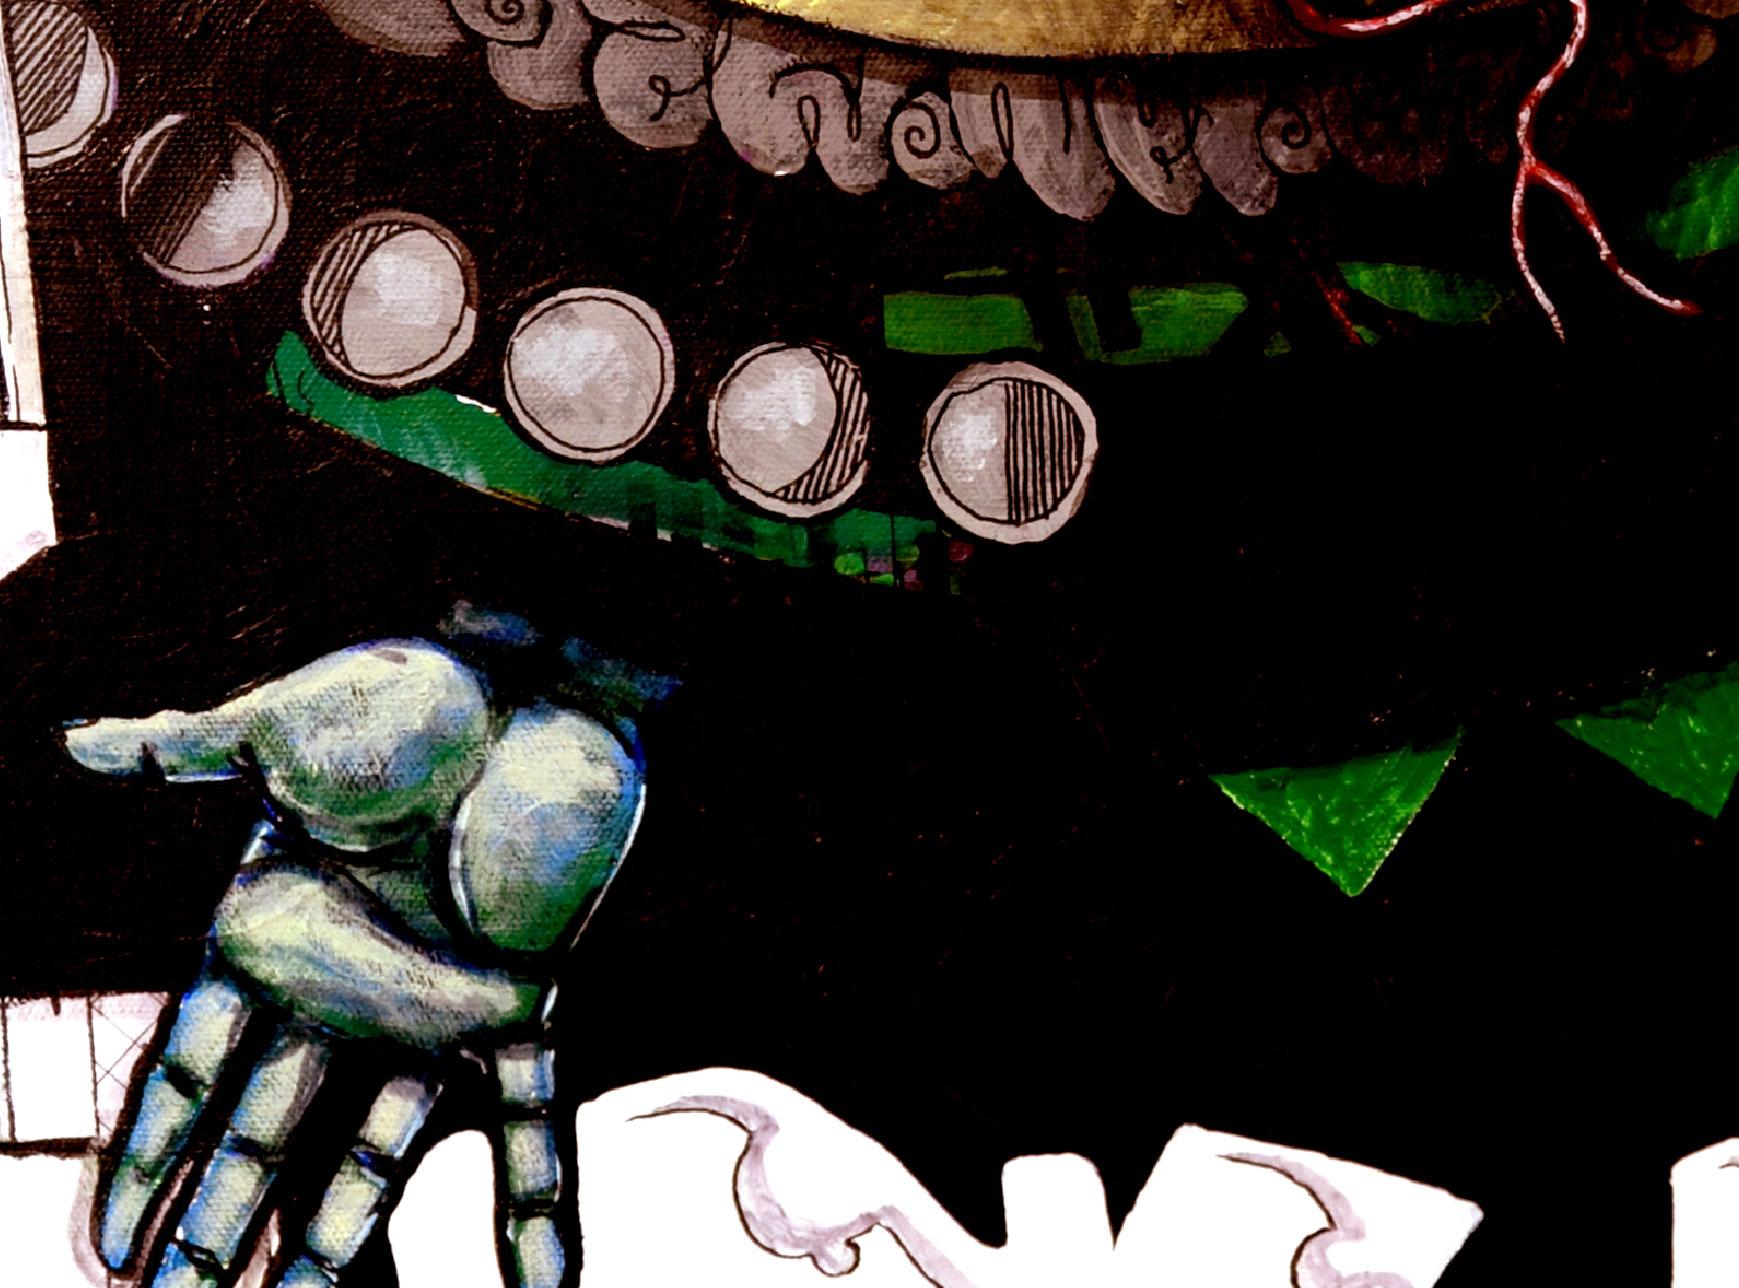 LacertaeDeus-Painting_Detail3.jpg